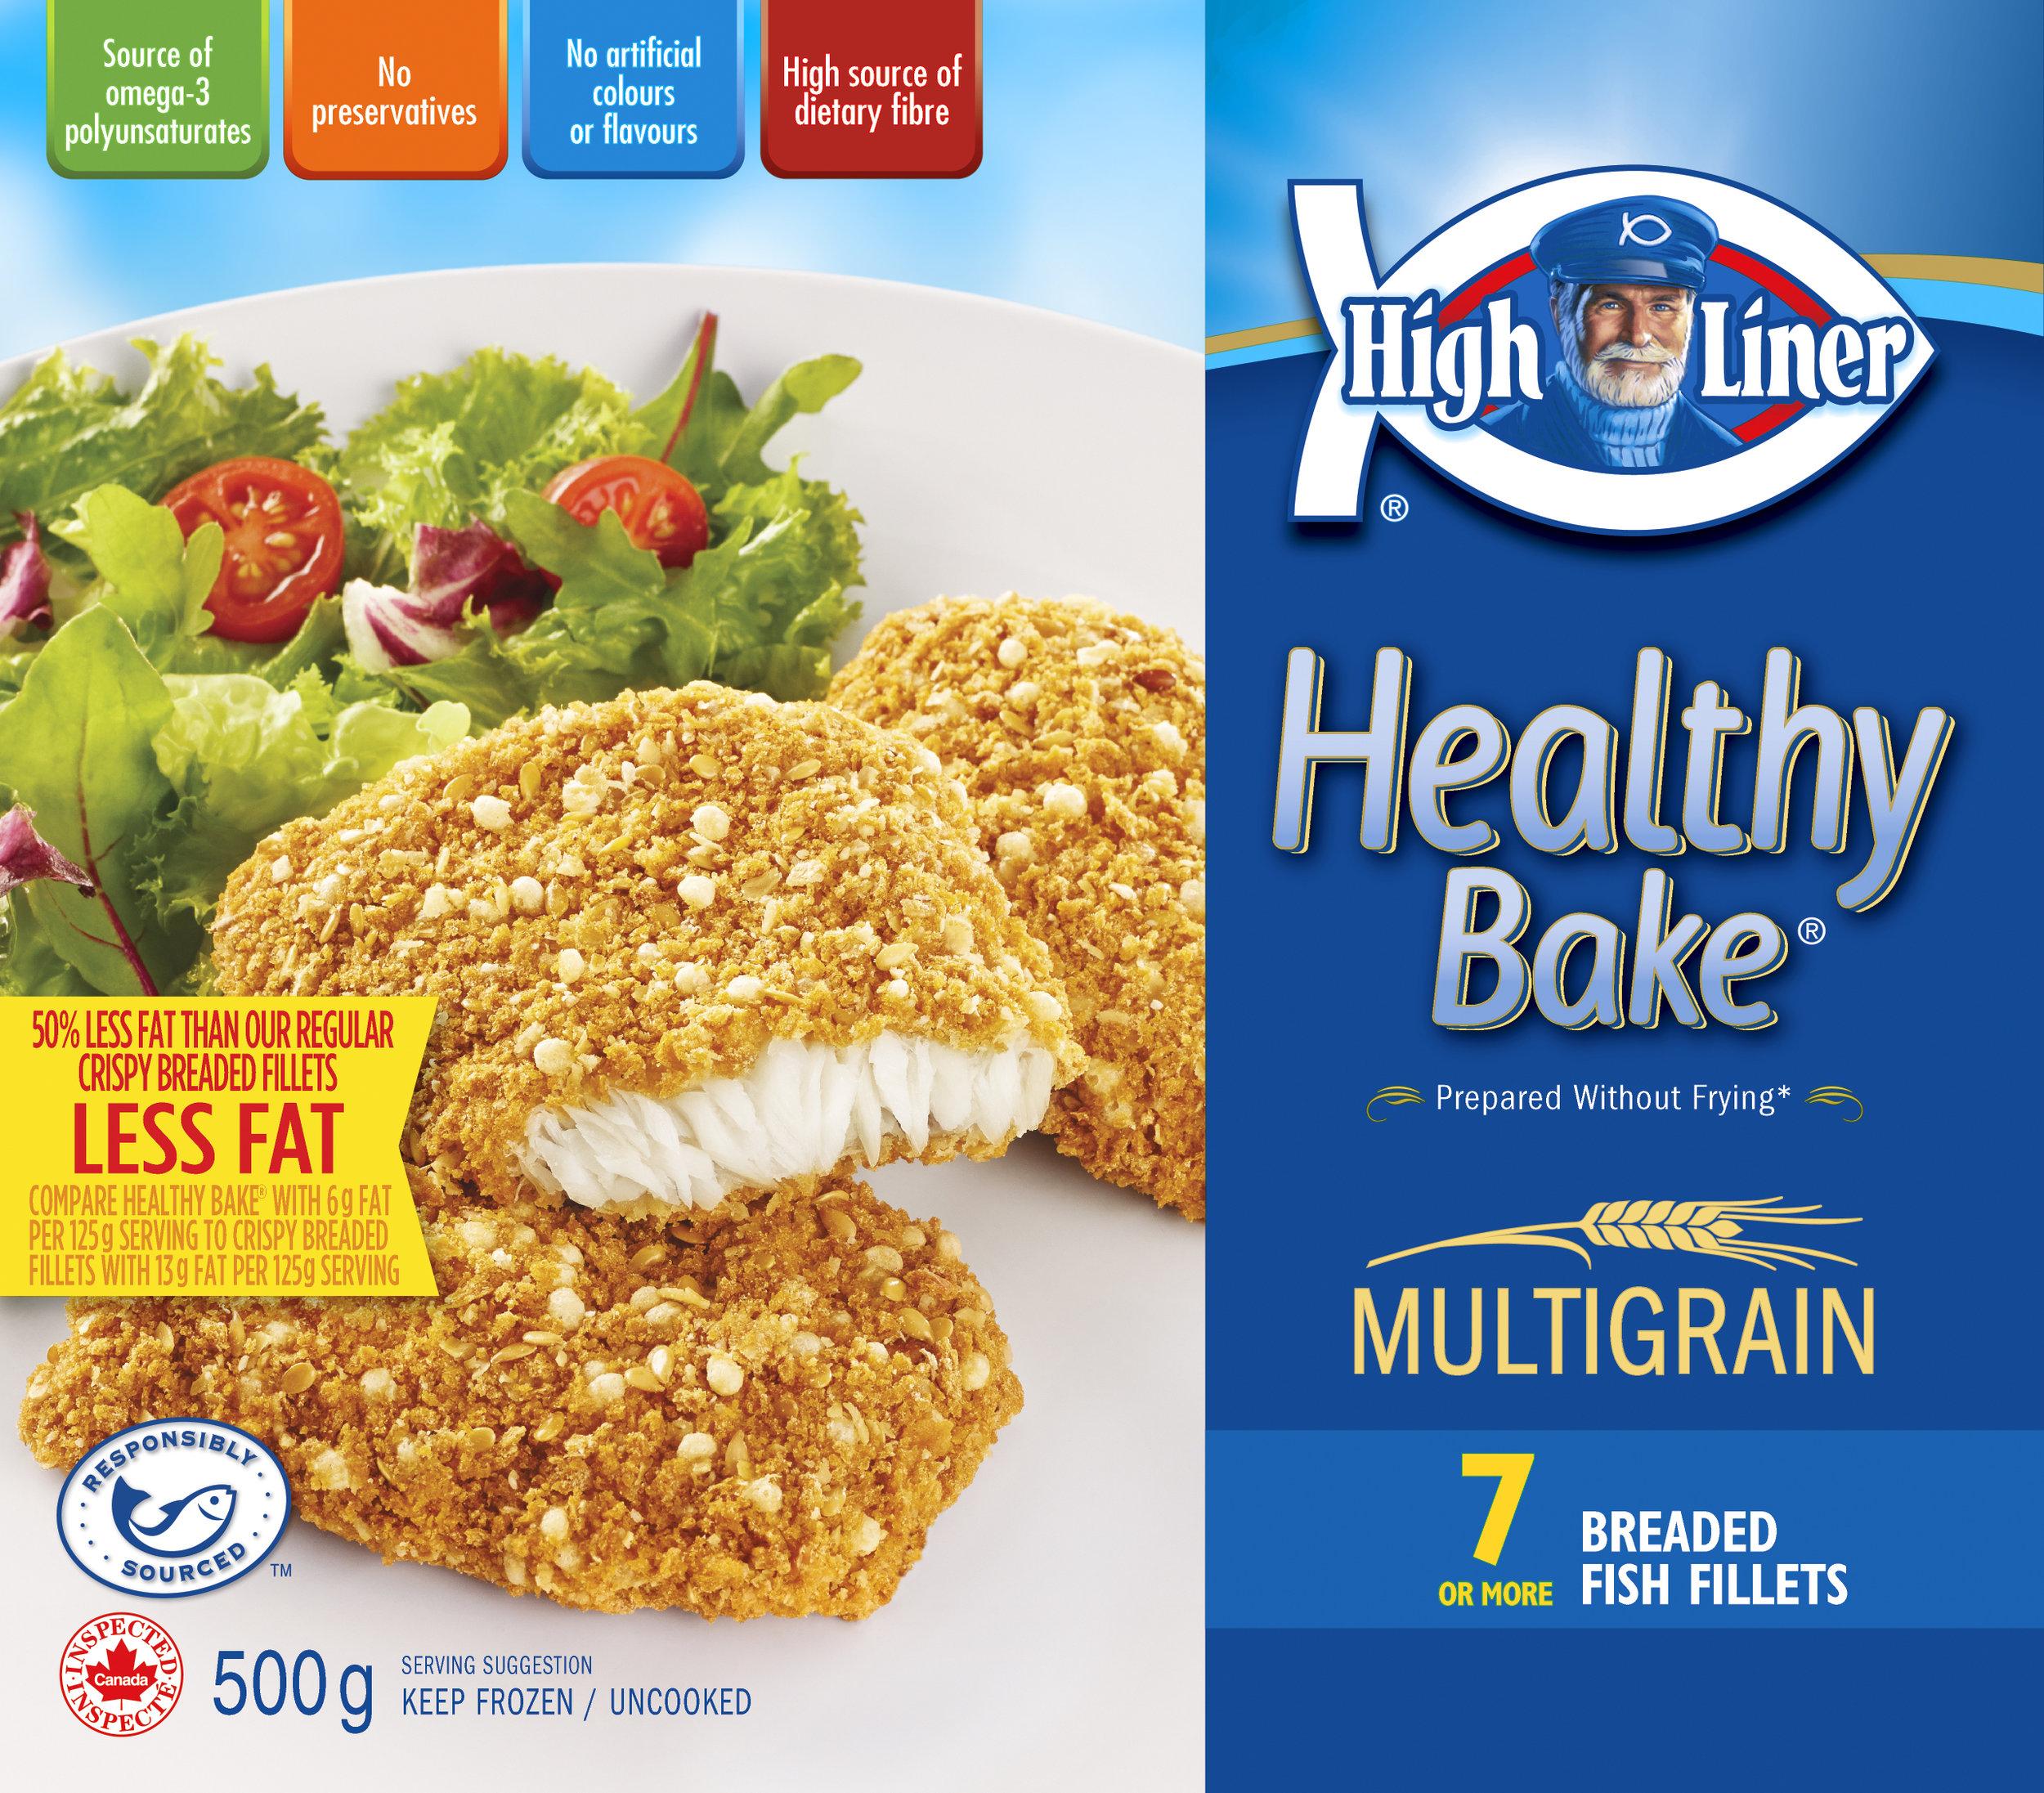 HealthyBake_eng_front_CJI_WEB.jpg